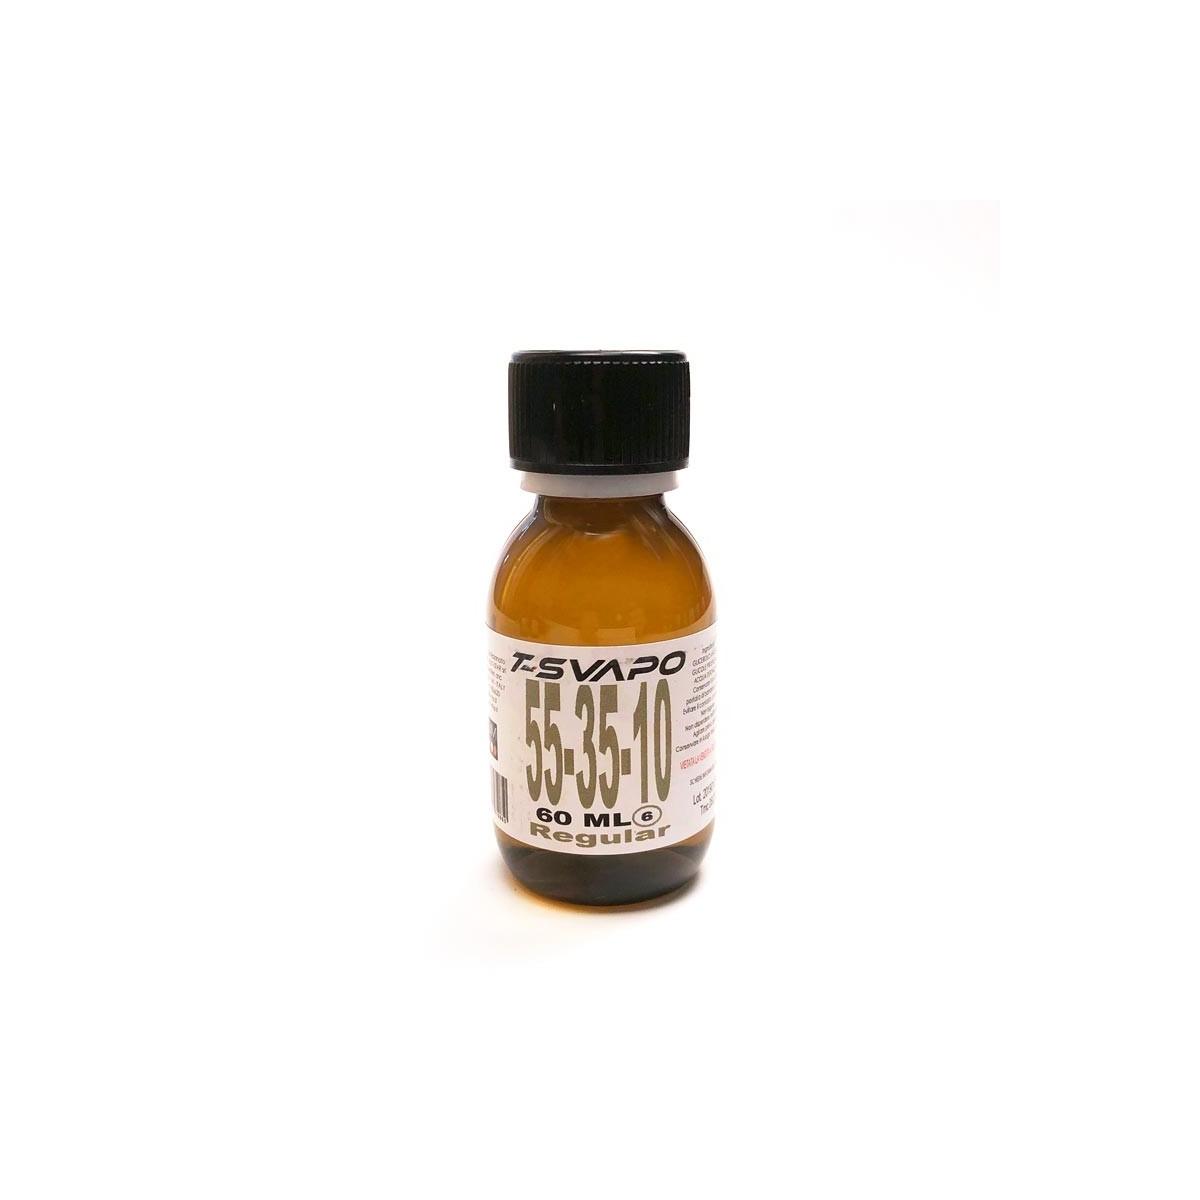 Base Neutra 60ml Senza Nicotina T-Svapo  - Normale